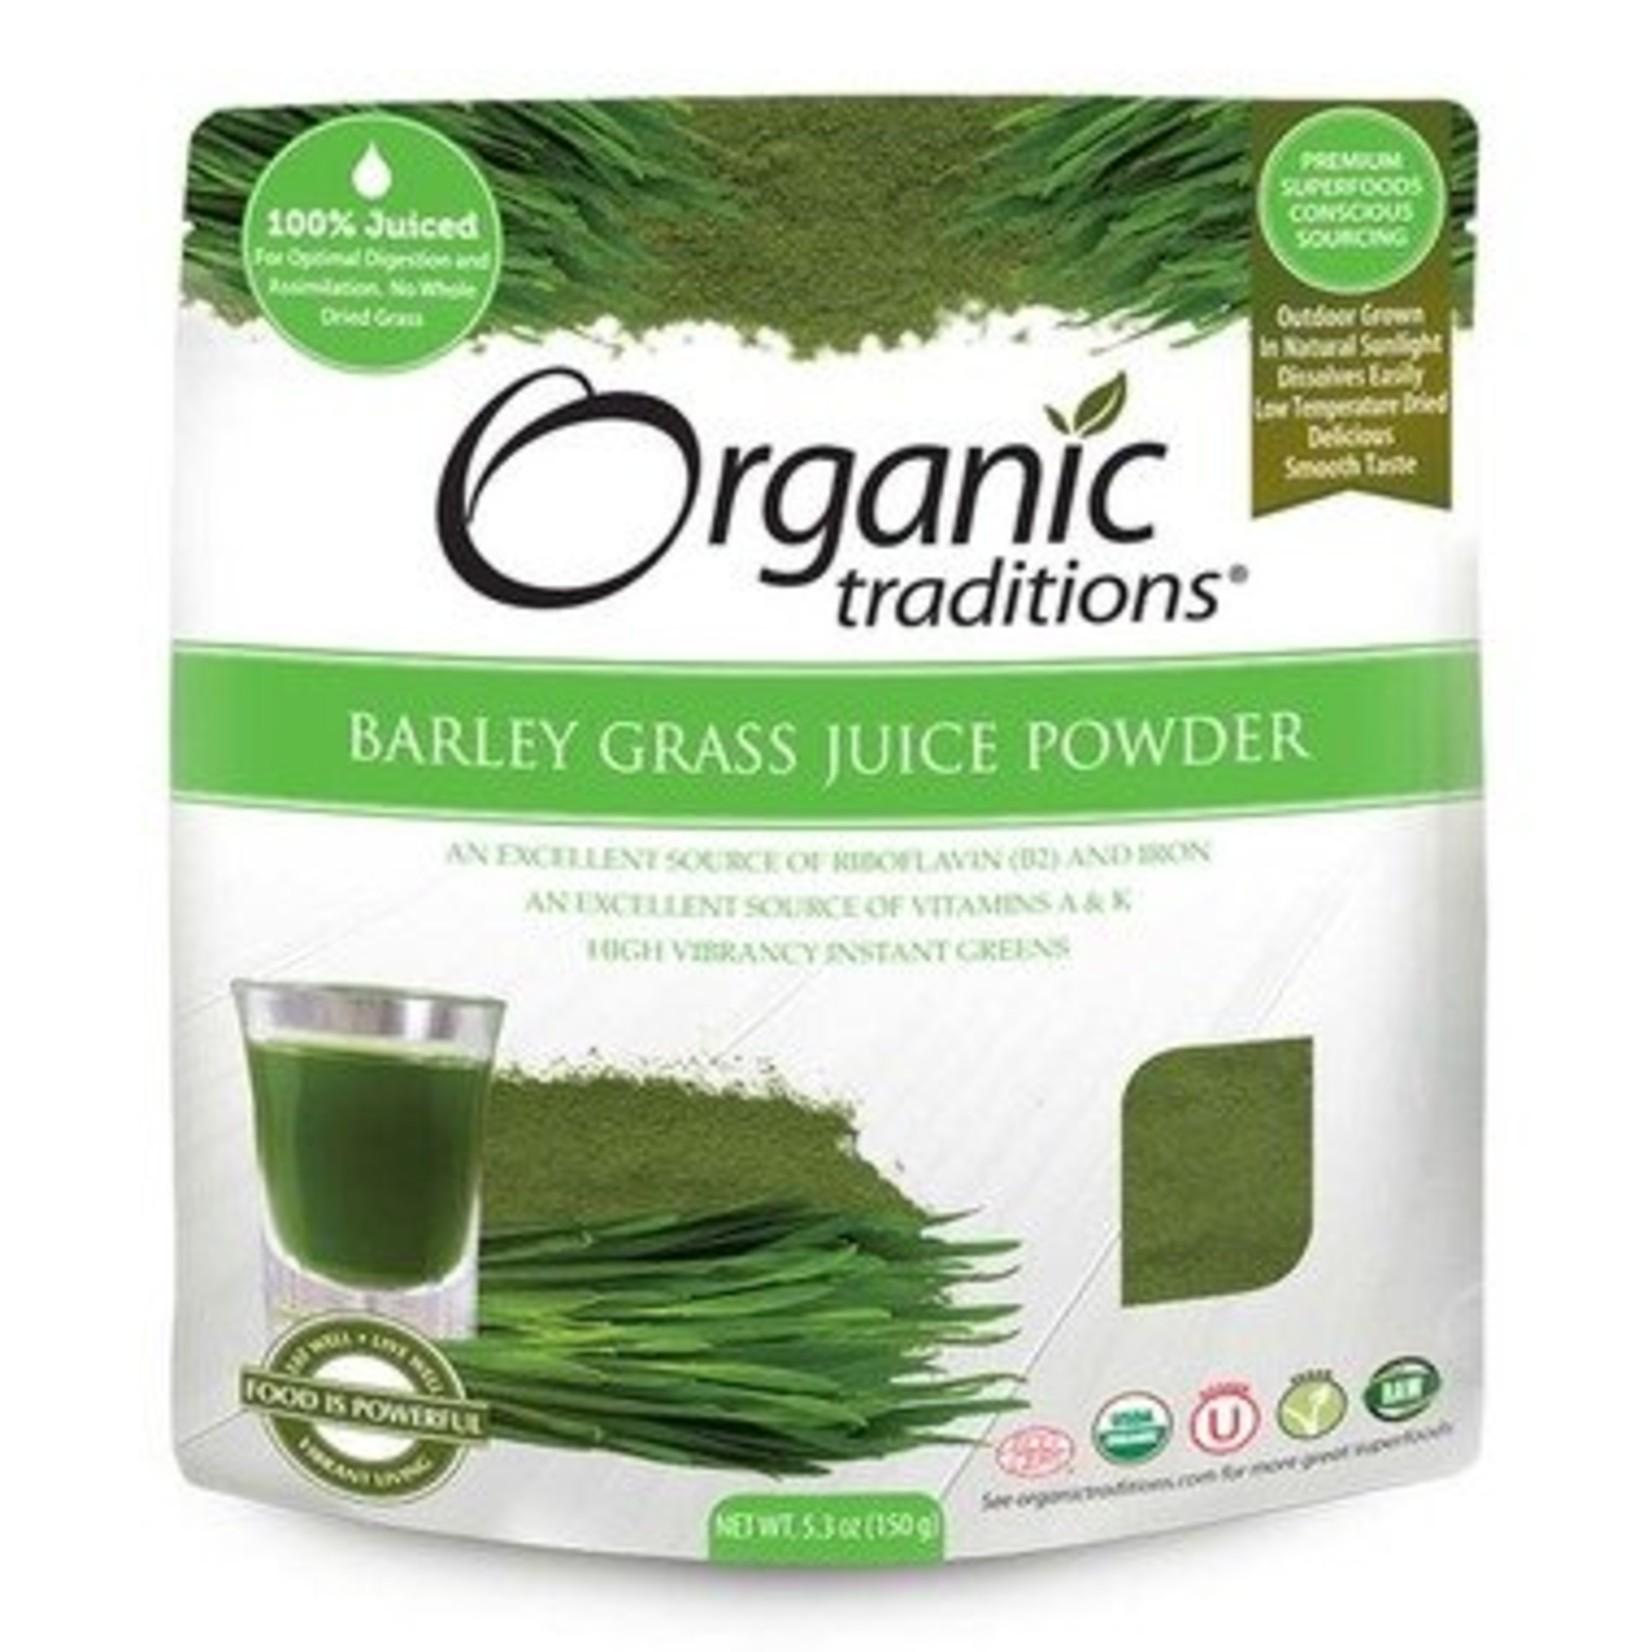 Organic Traditions Barley Grass Juice Powder 150g